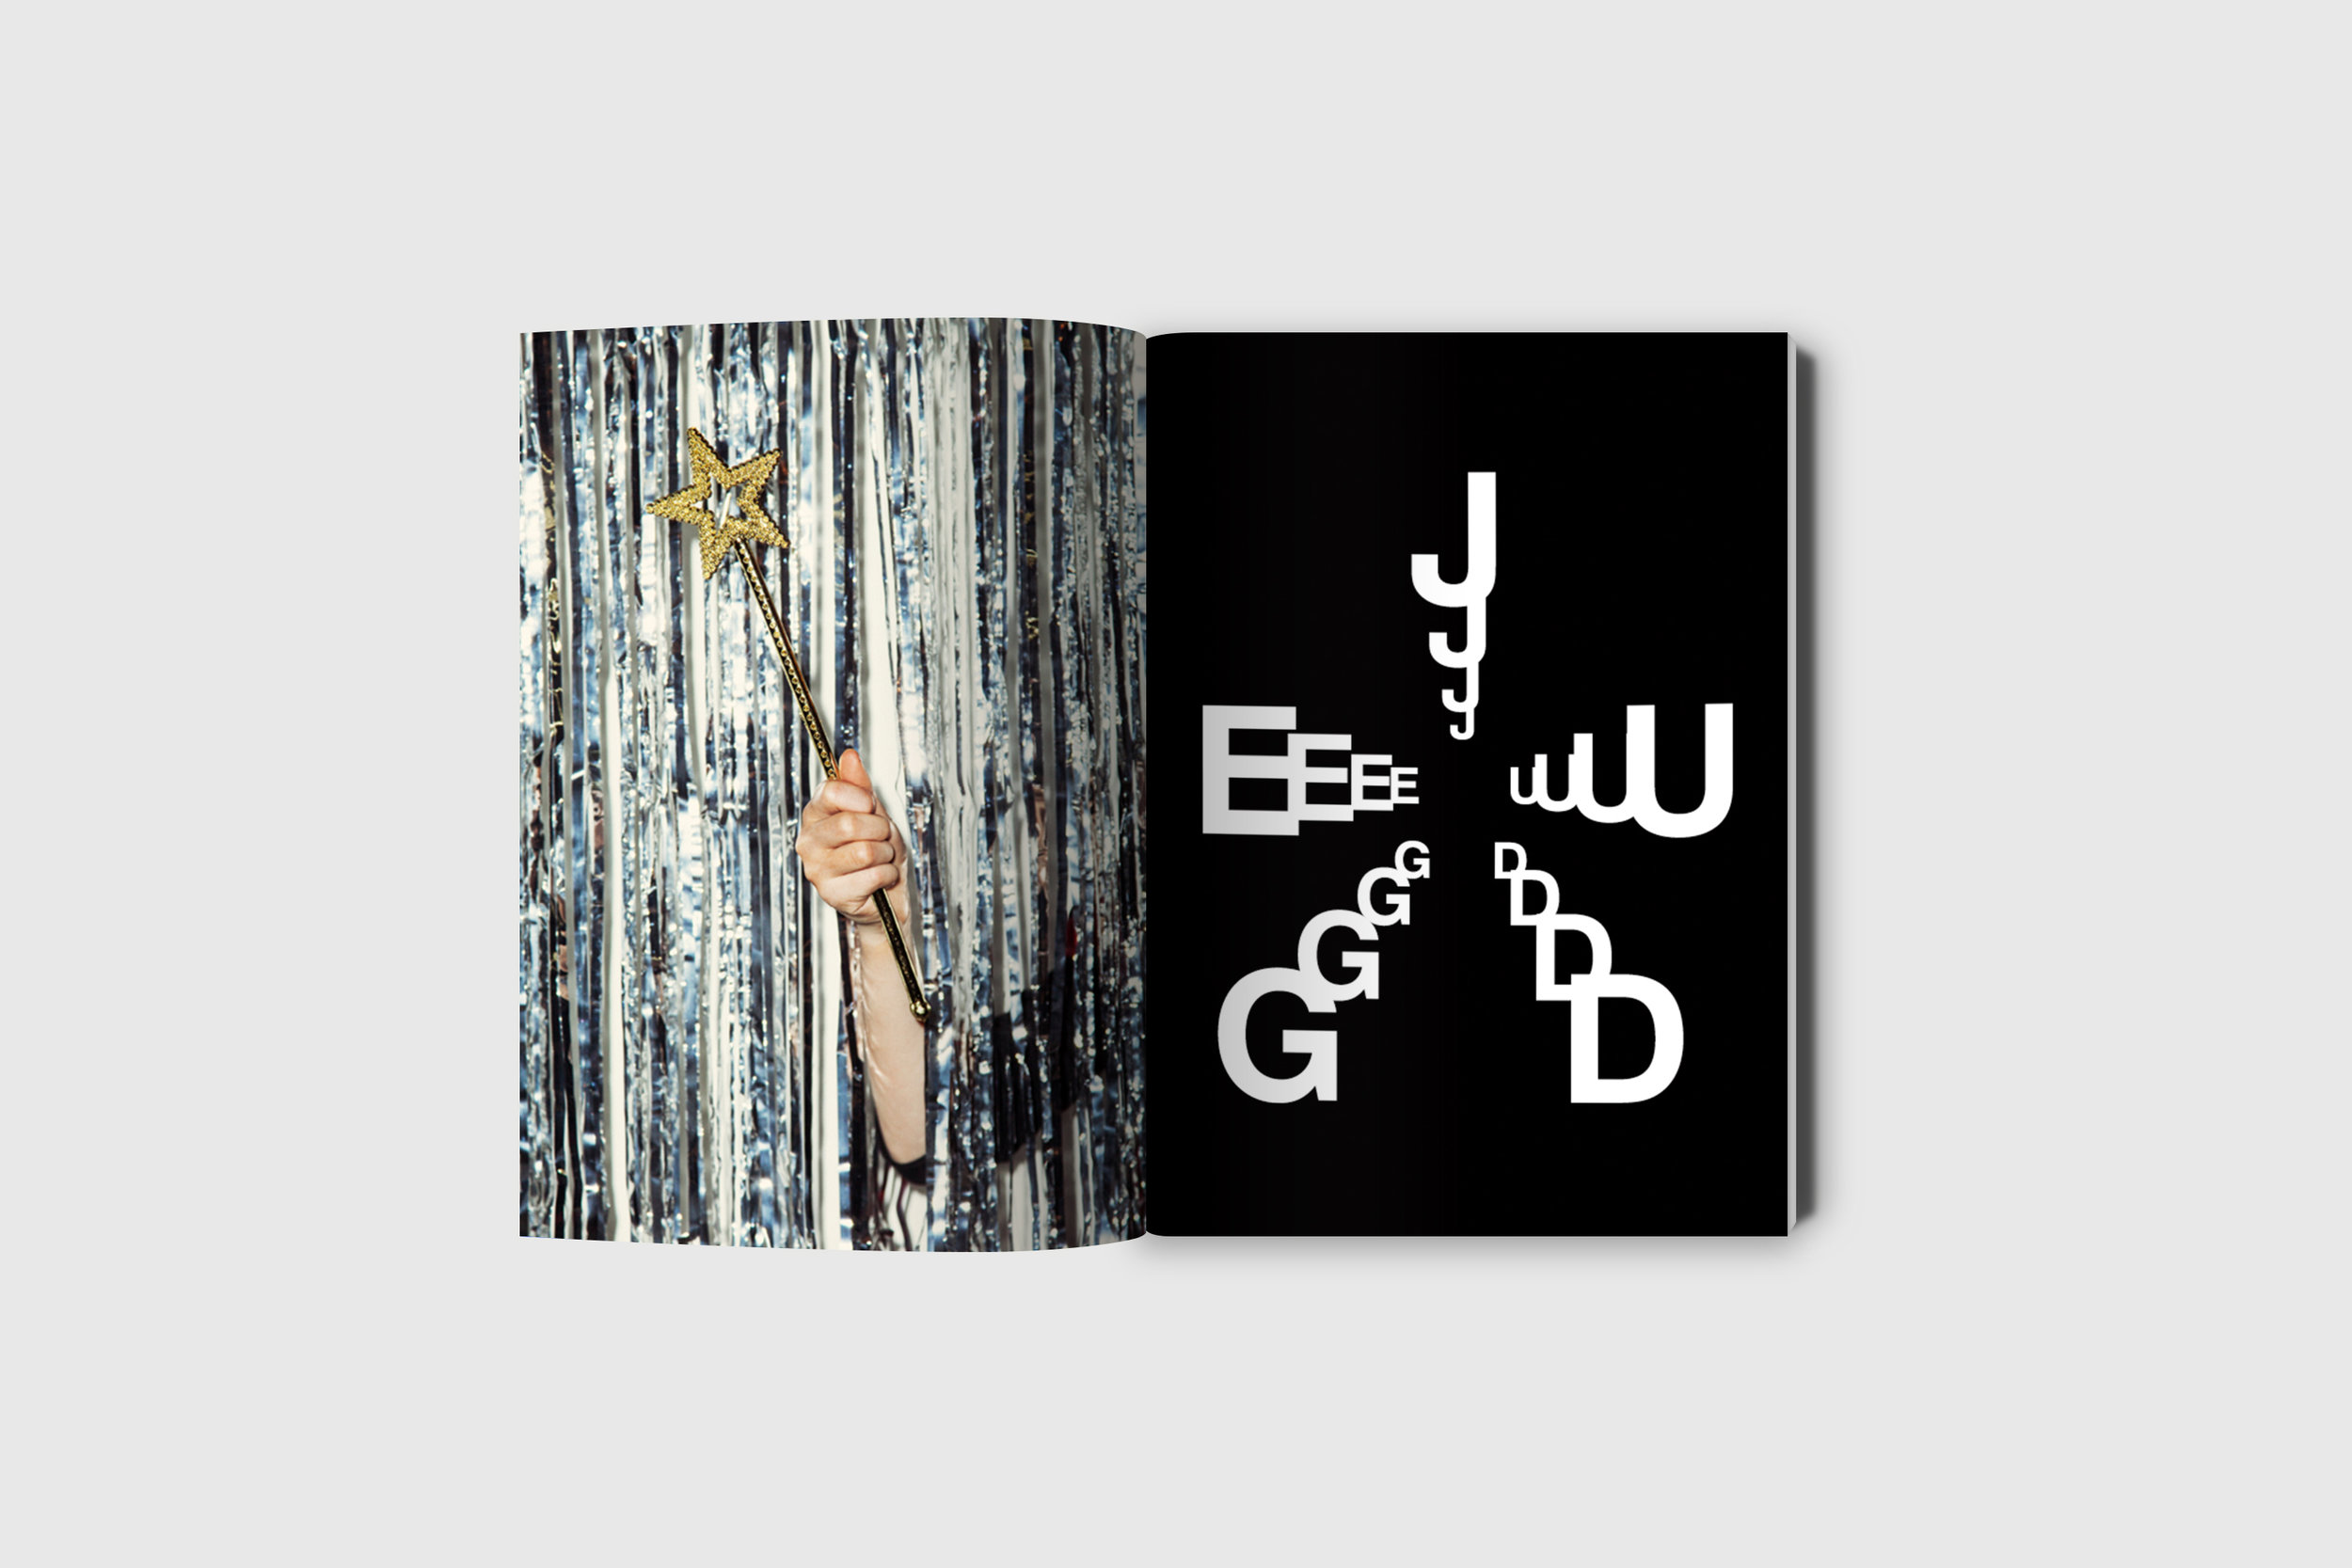 Art Direction: Alexander Blackberry | Photography: Linda Stulic | Graphic Design: Eszter Takacs